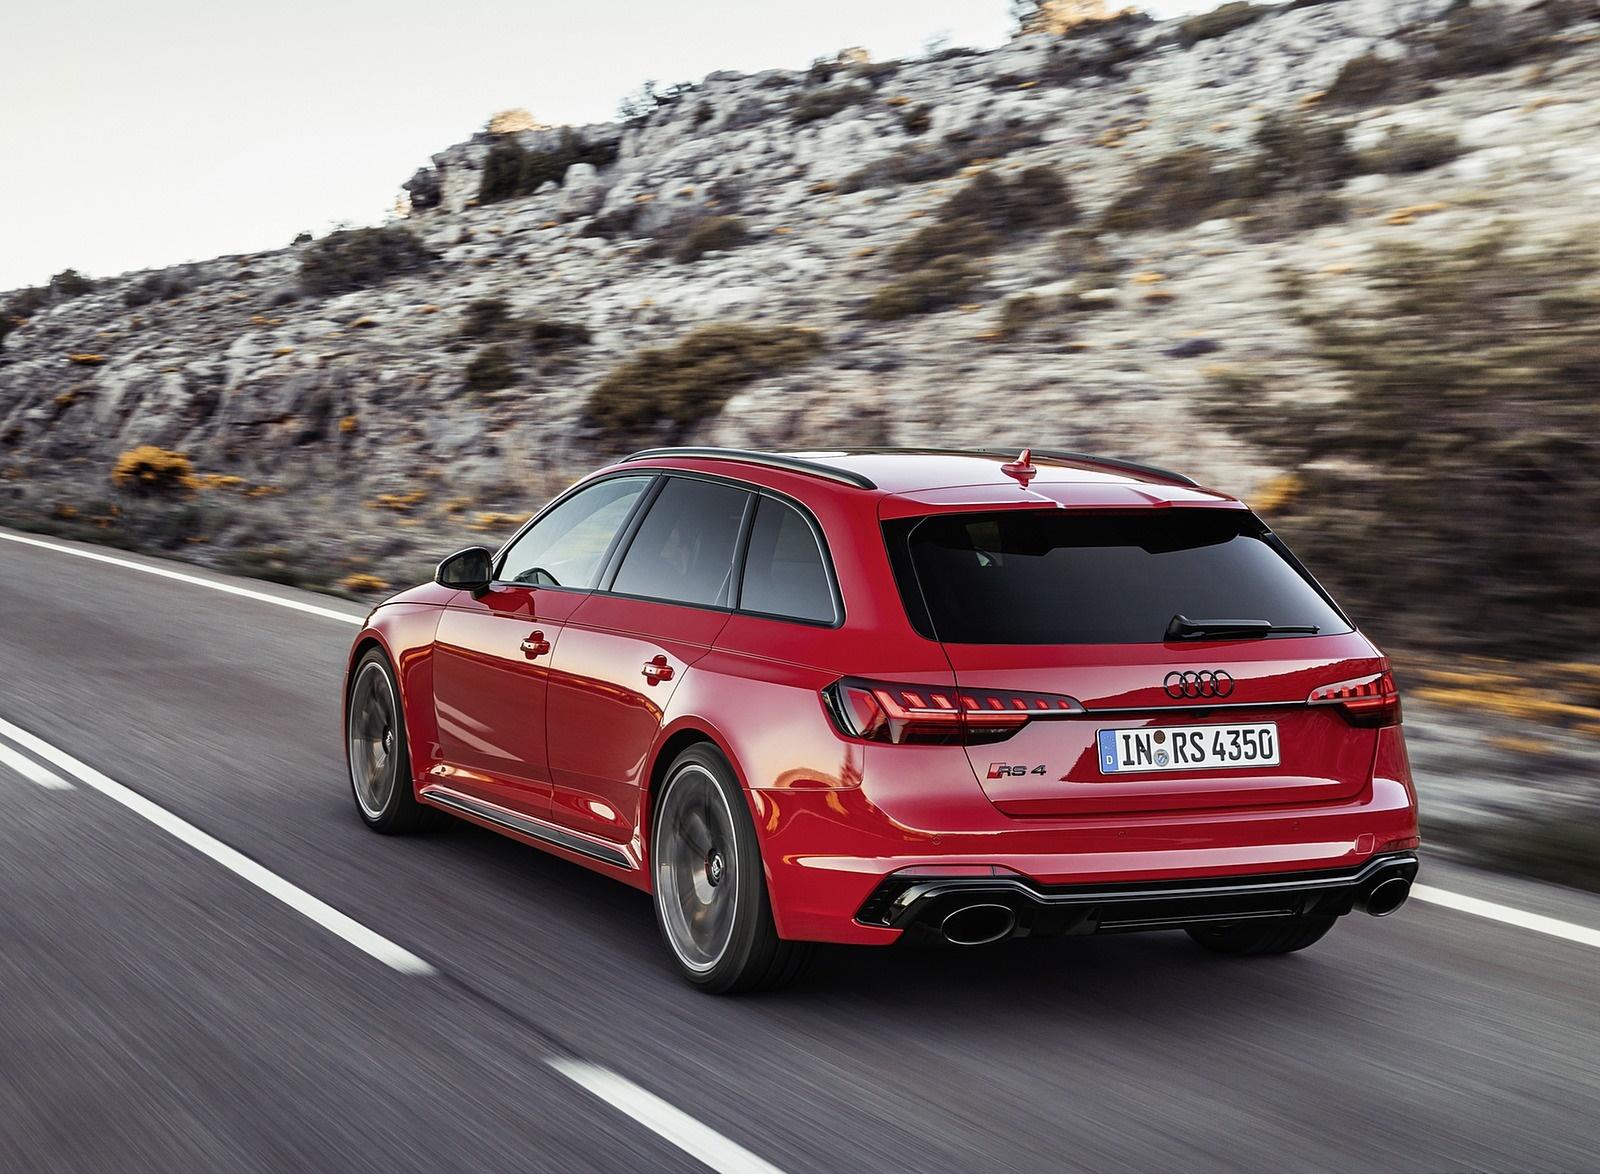 2020 Audi RS 4 Avant (Color: Tango Red) Rear Three-Quarter Wallpapers (6)